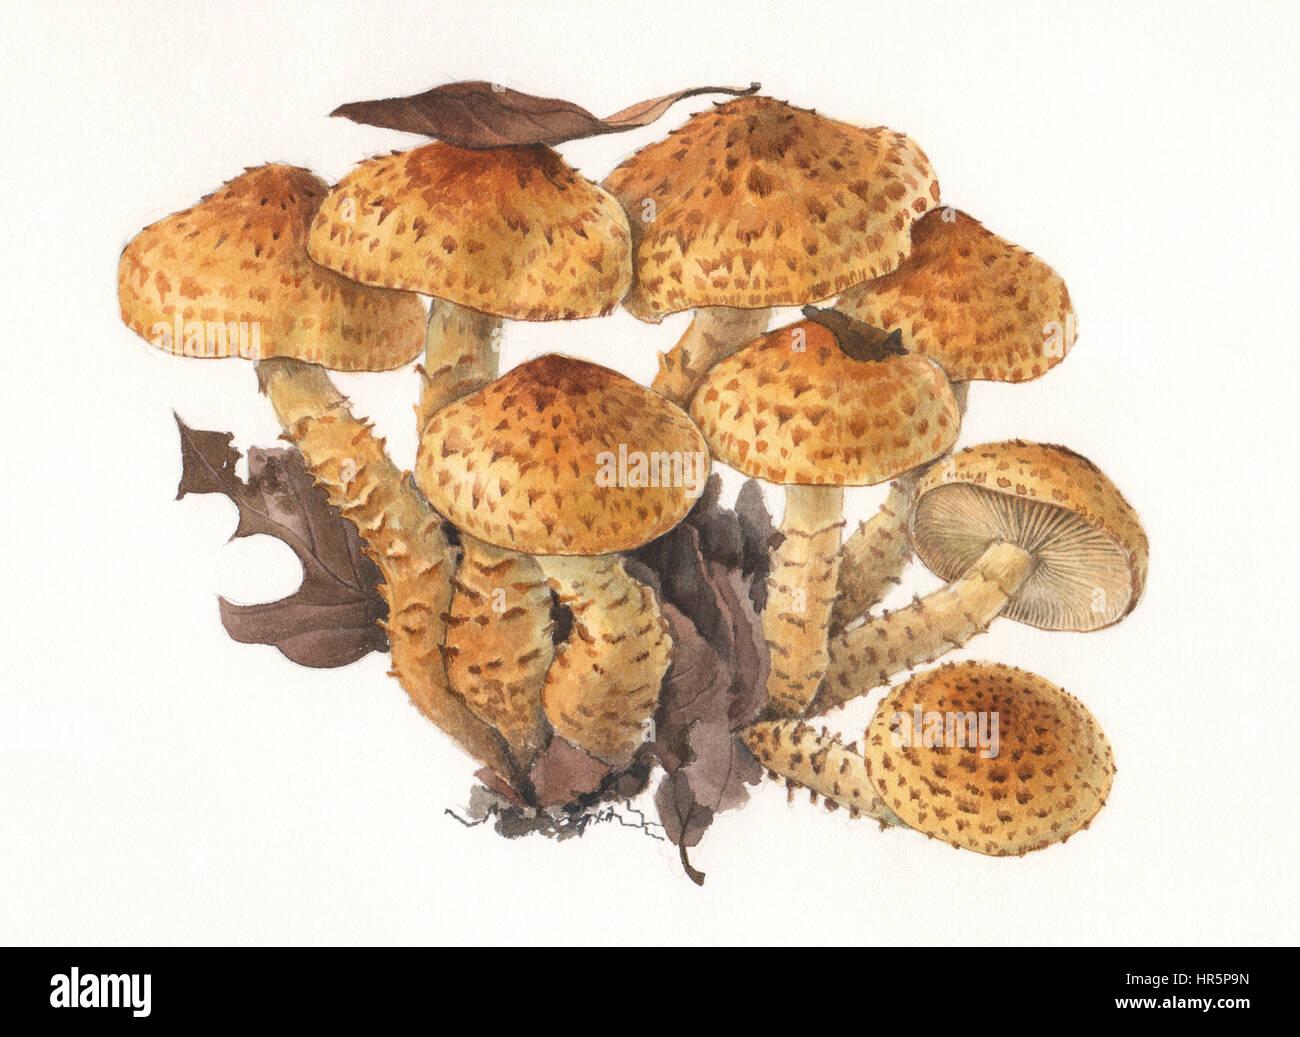 Mushrooms Pholiota scuarrosa. Hand painted watercolor illustration of wild mushrooms in natural context, against - Stock Image